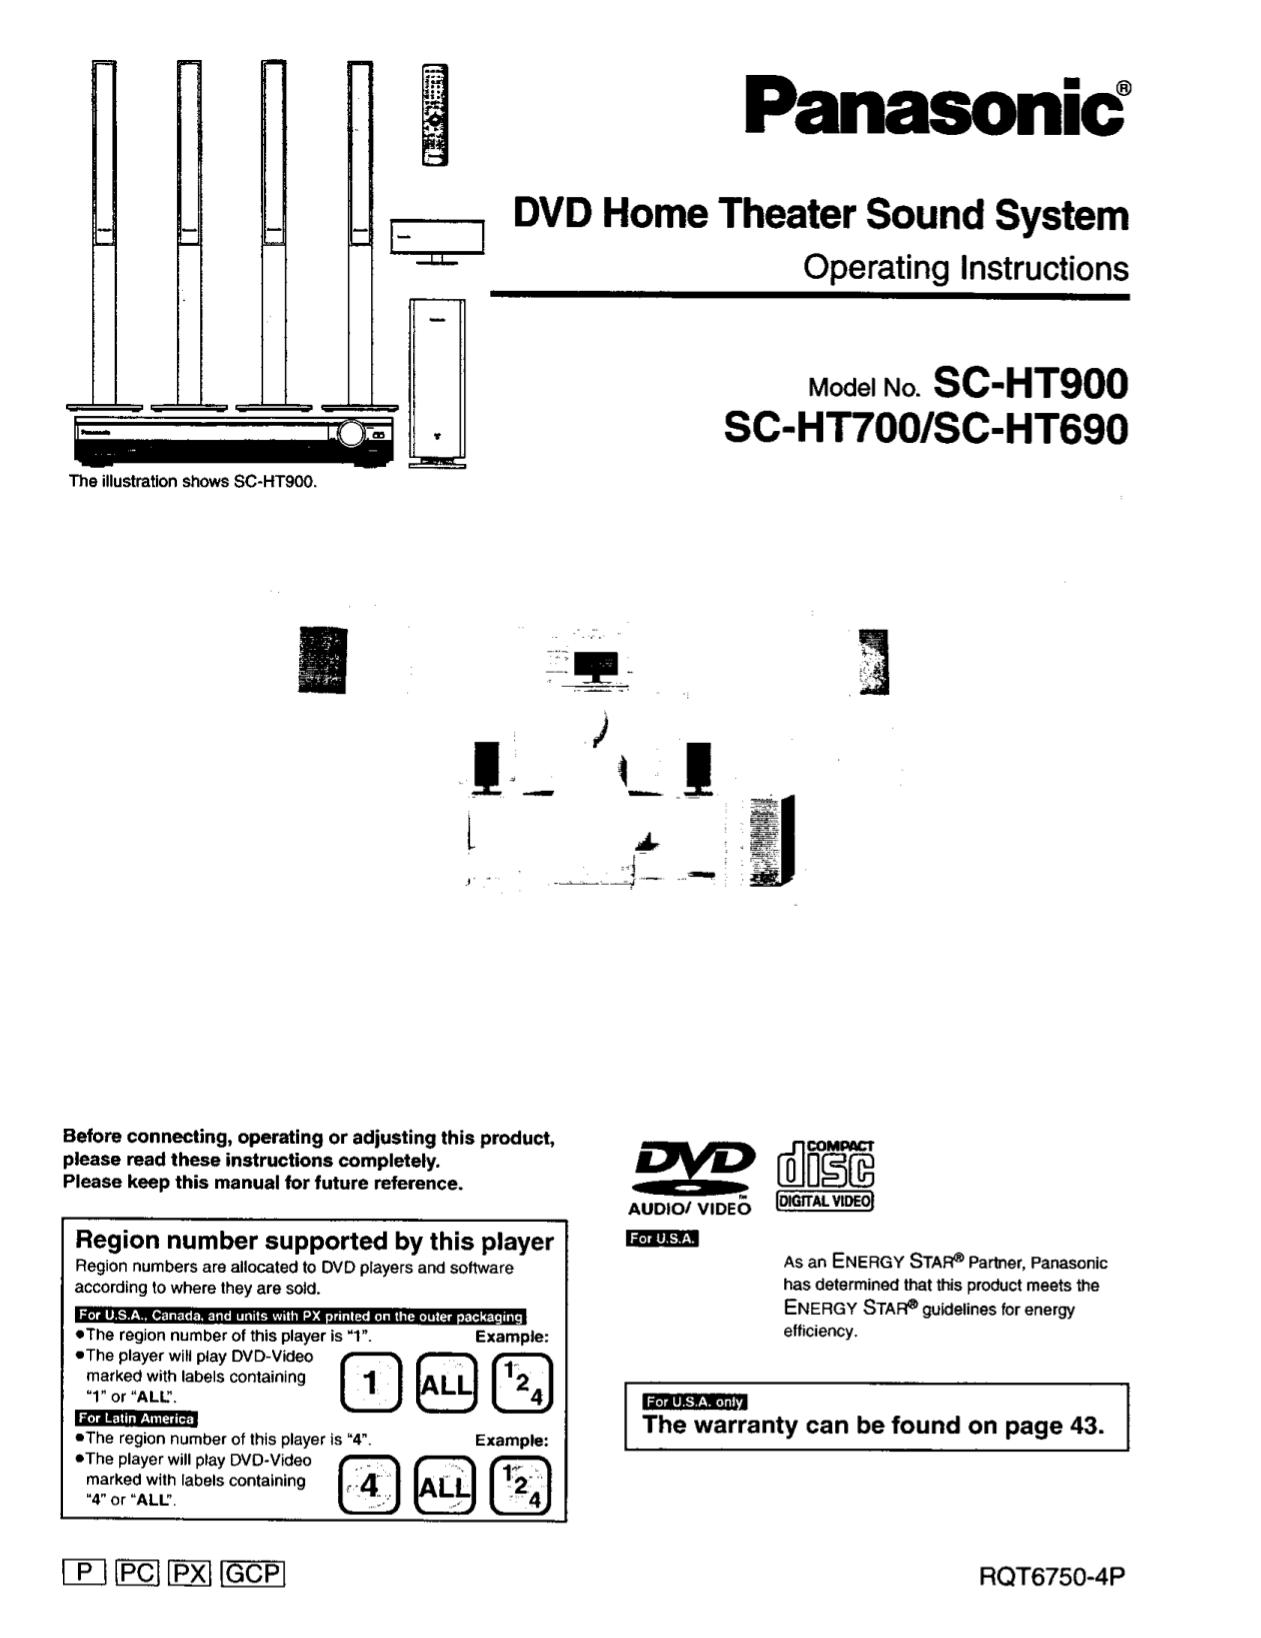 download free pdf for panasonic sa ht900 home theater manual rh umlib com panasonic sa-ht900 manual pdf panasonic sa-ht900 manual pdf